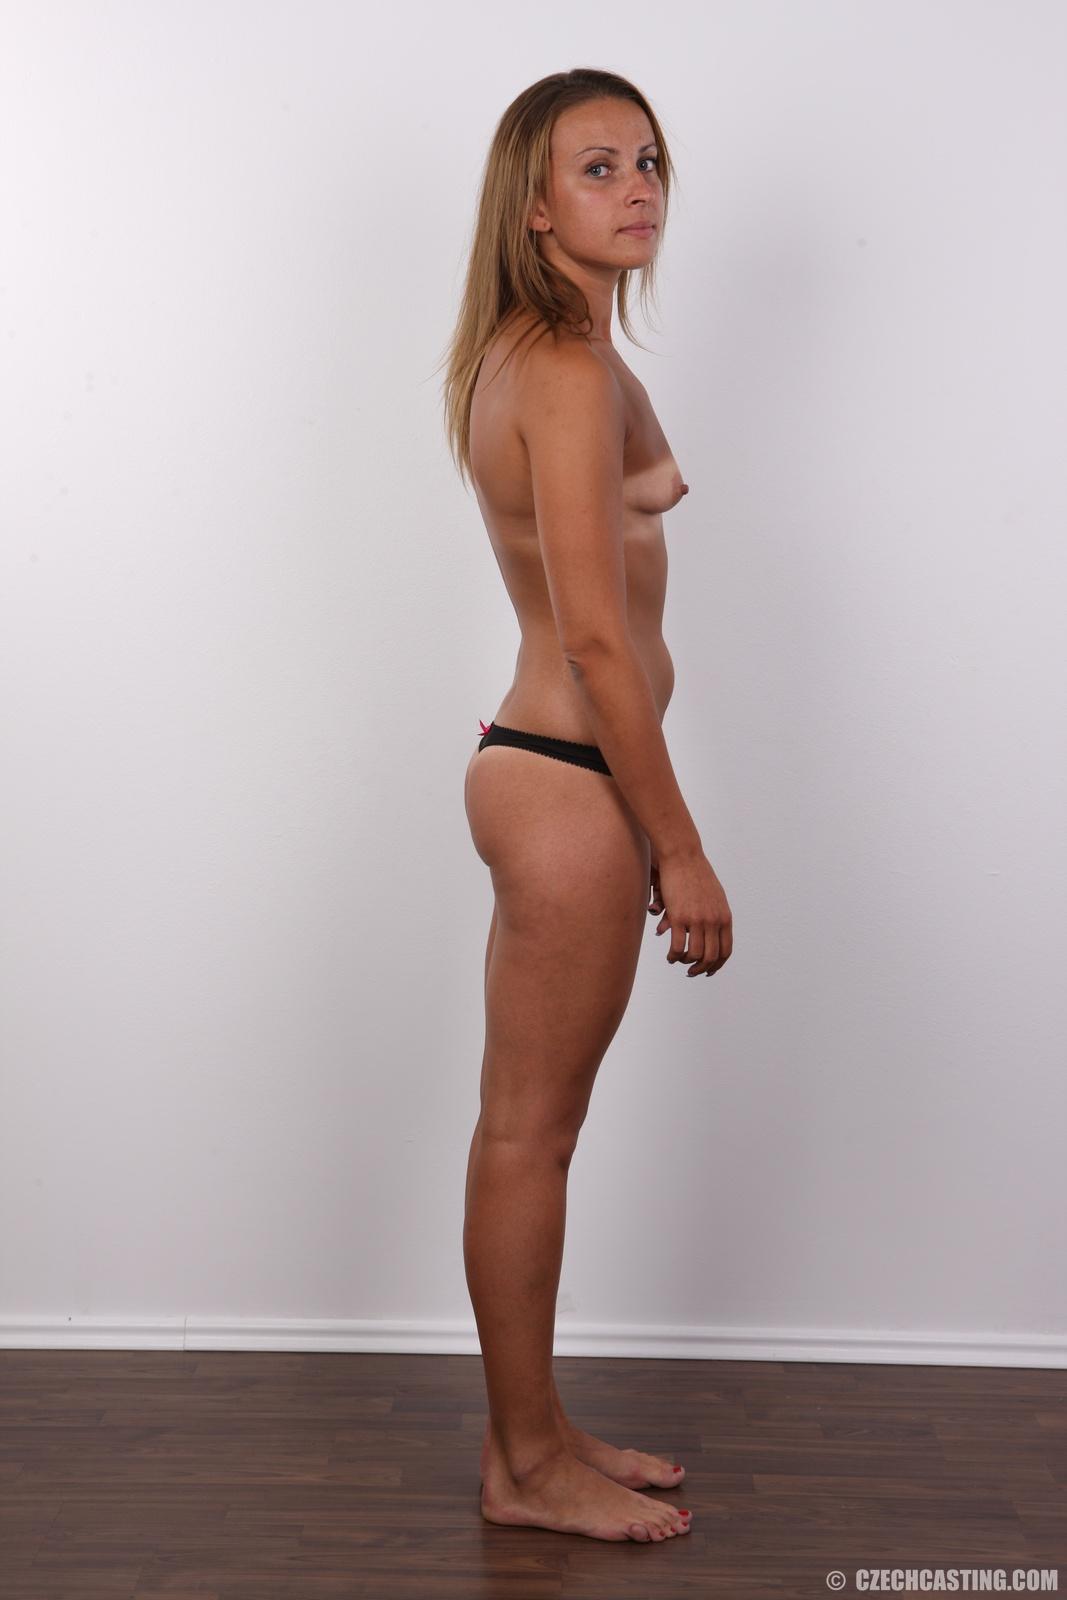 women Czech sex republic nude